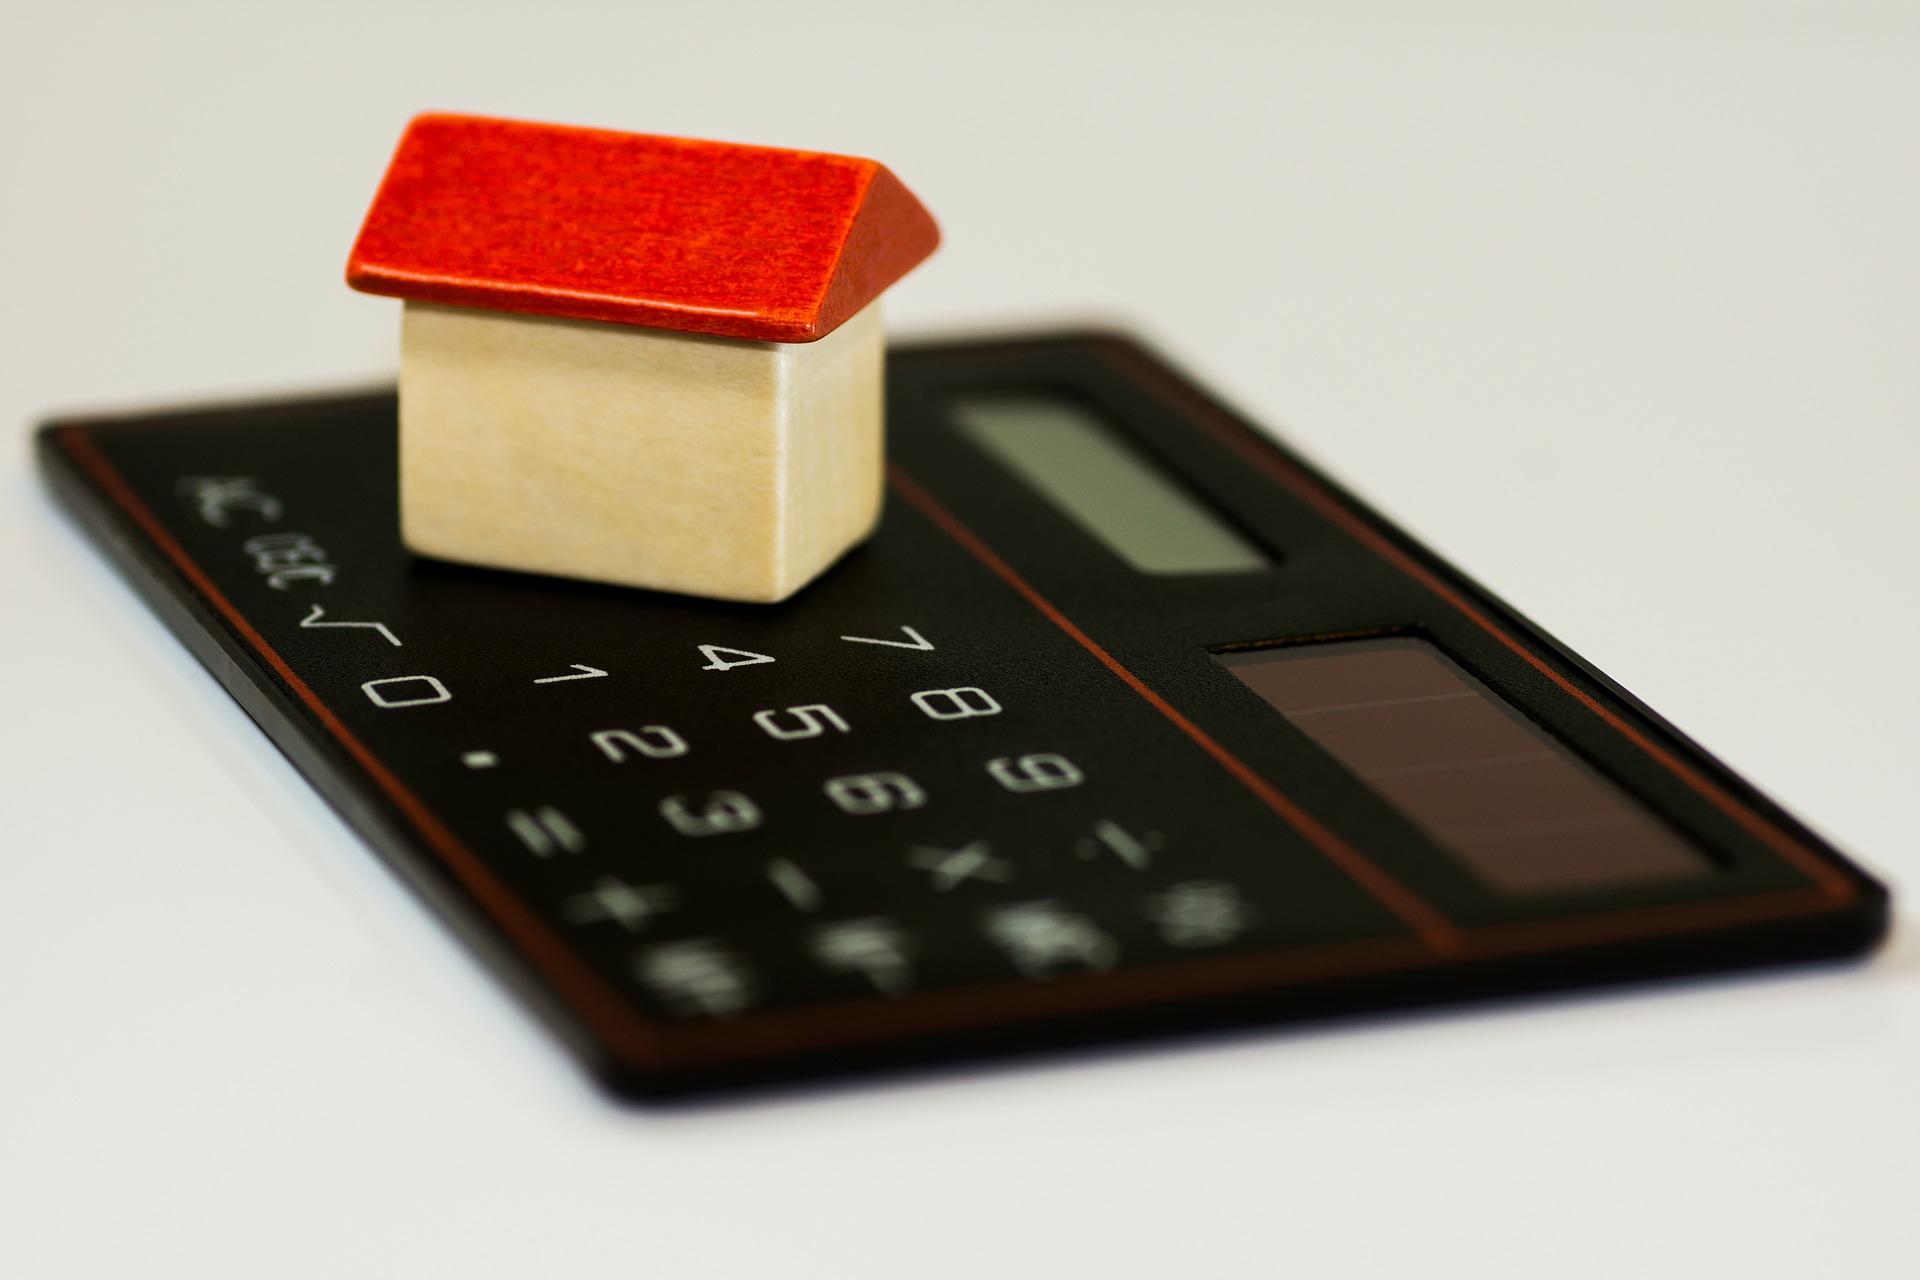 immobilienbewertung wohnung ertragswertverfahren. Black Bedroom Furniture Sets. Home Design Ideas